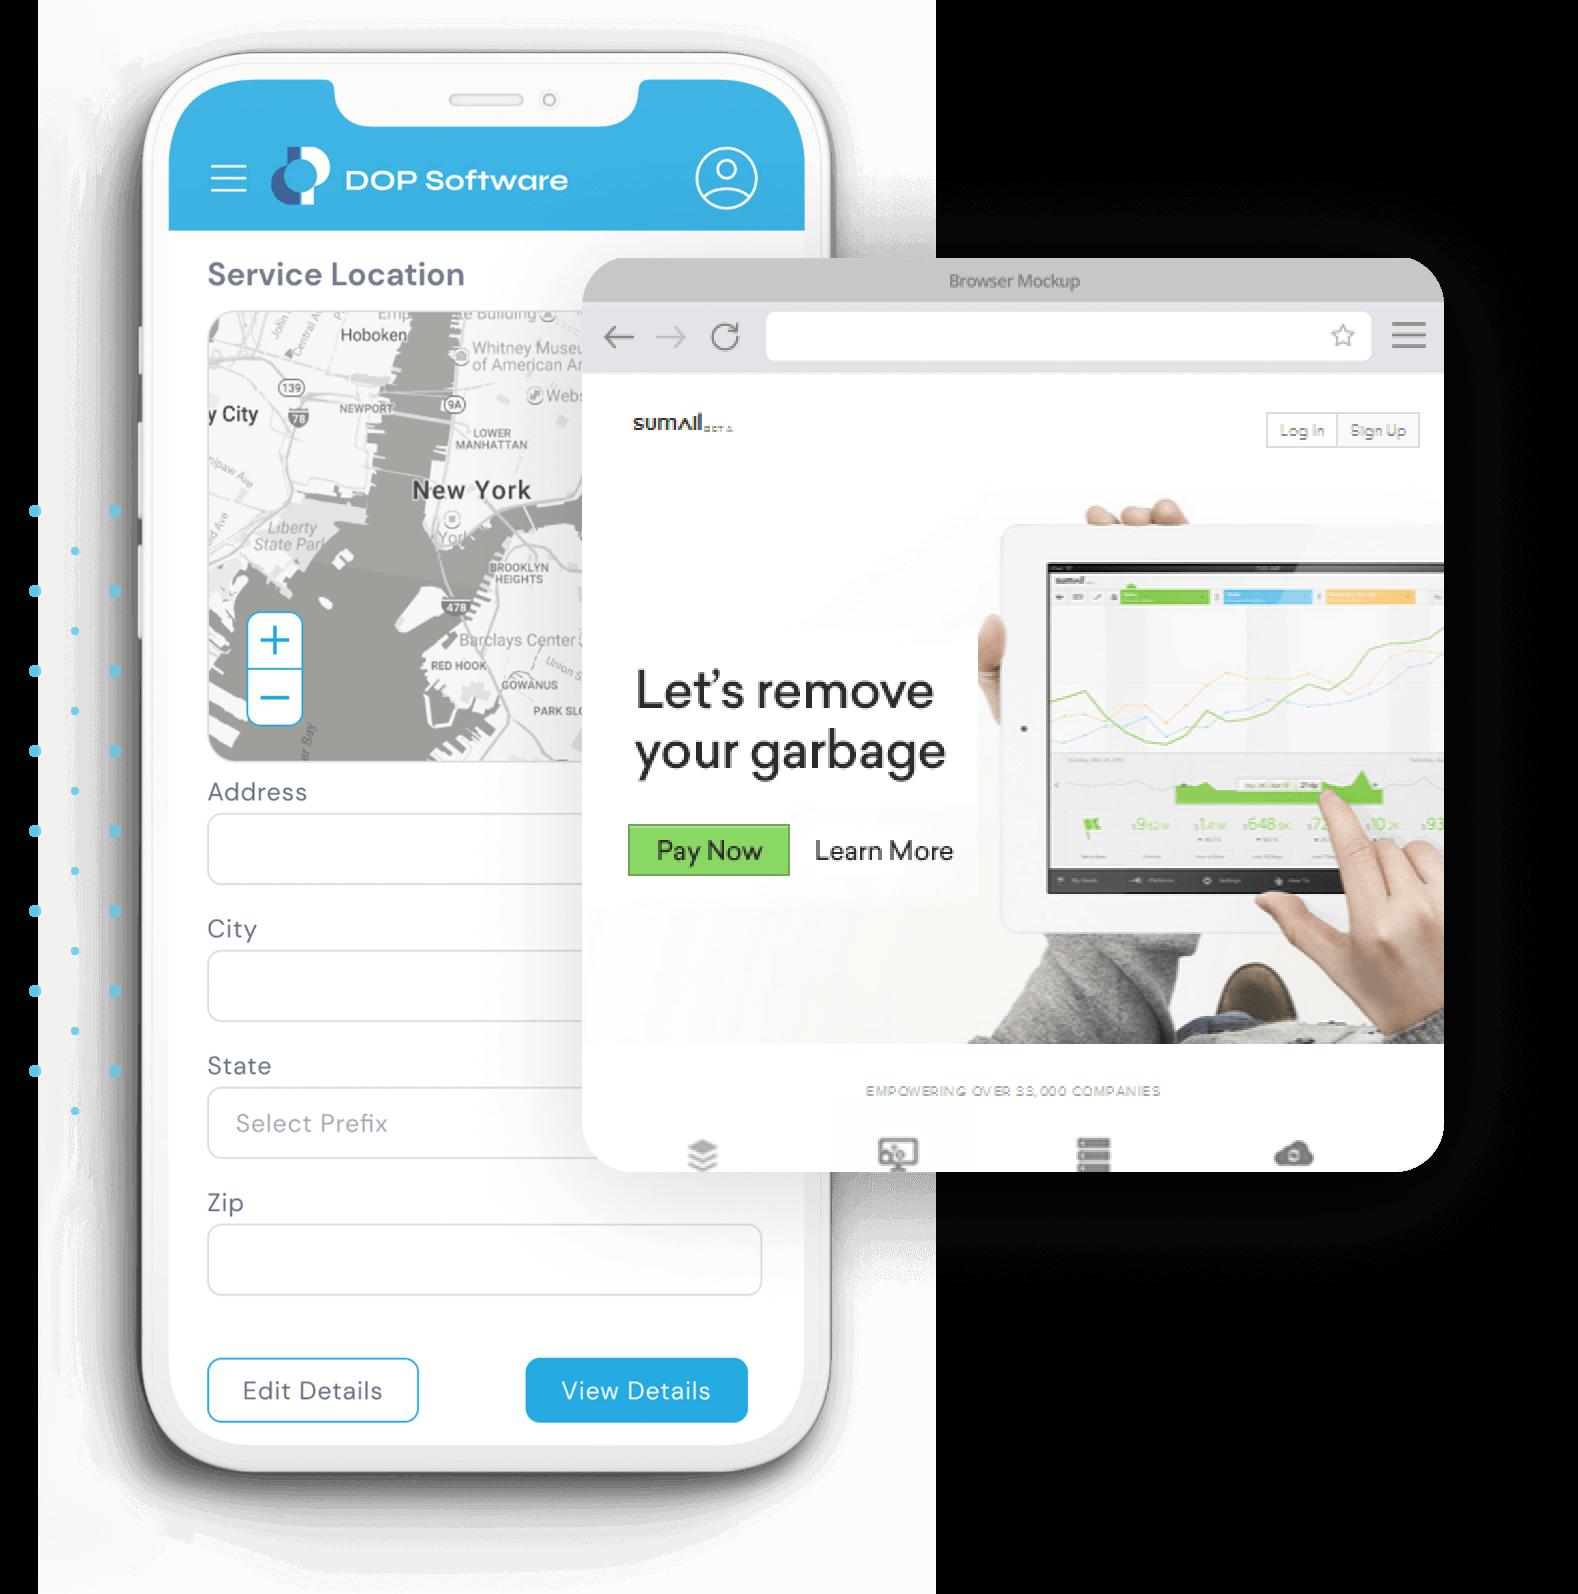 Mobile/web development image